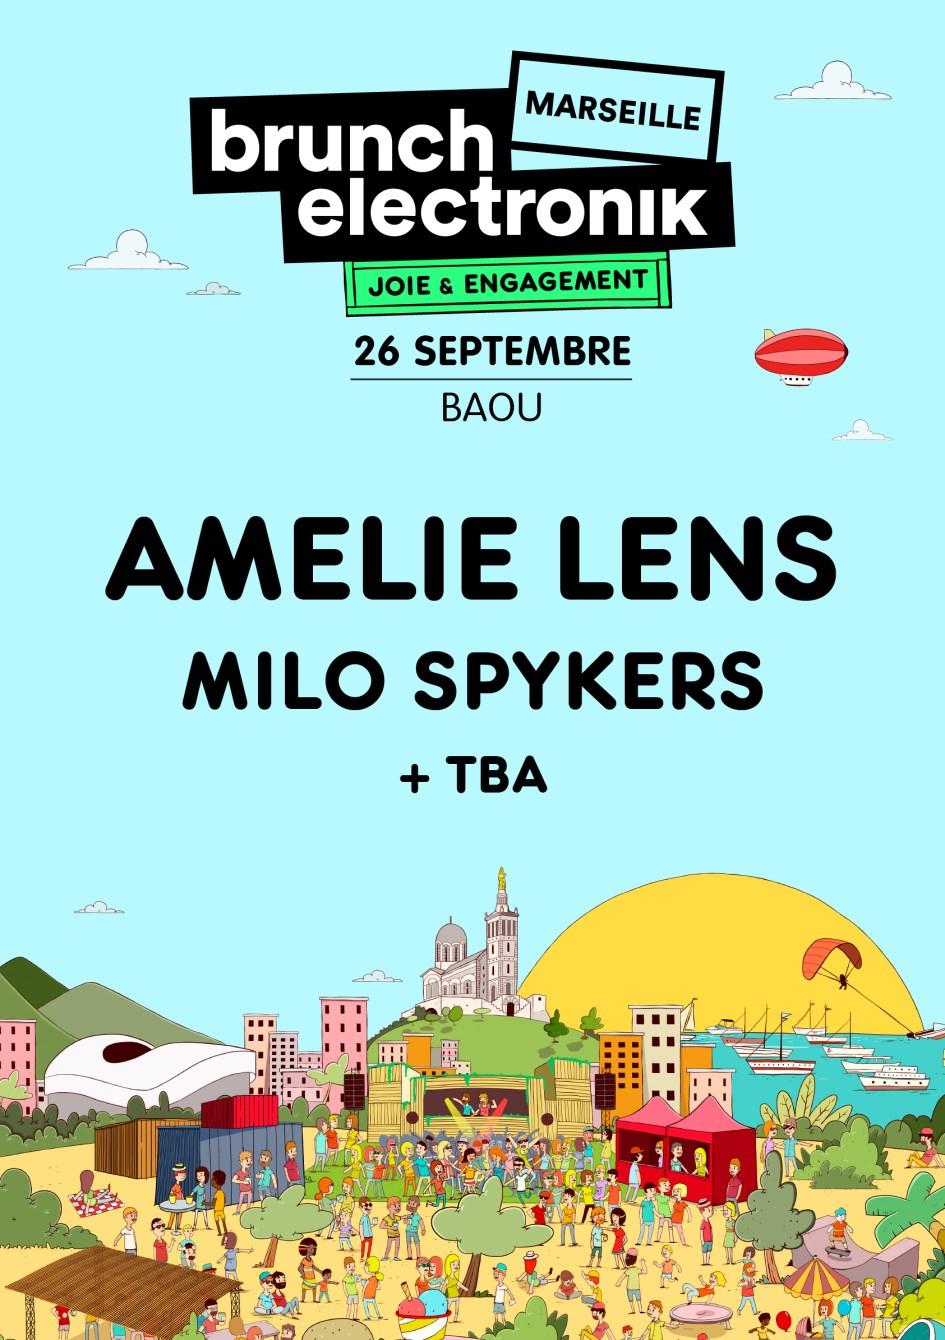 Brunch Electronik Marseille #2: Amelie Lens, Milo Spykers + TBA - Flyer front